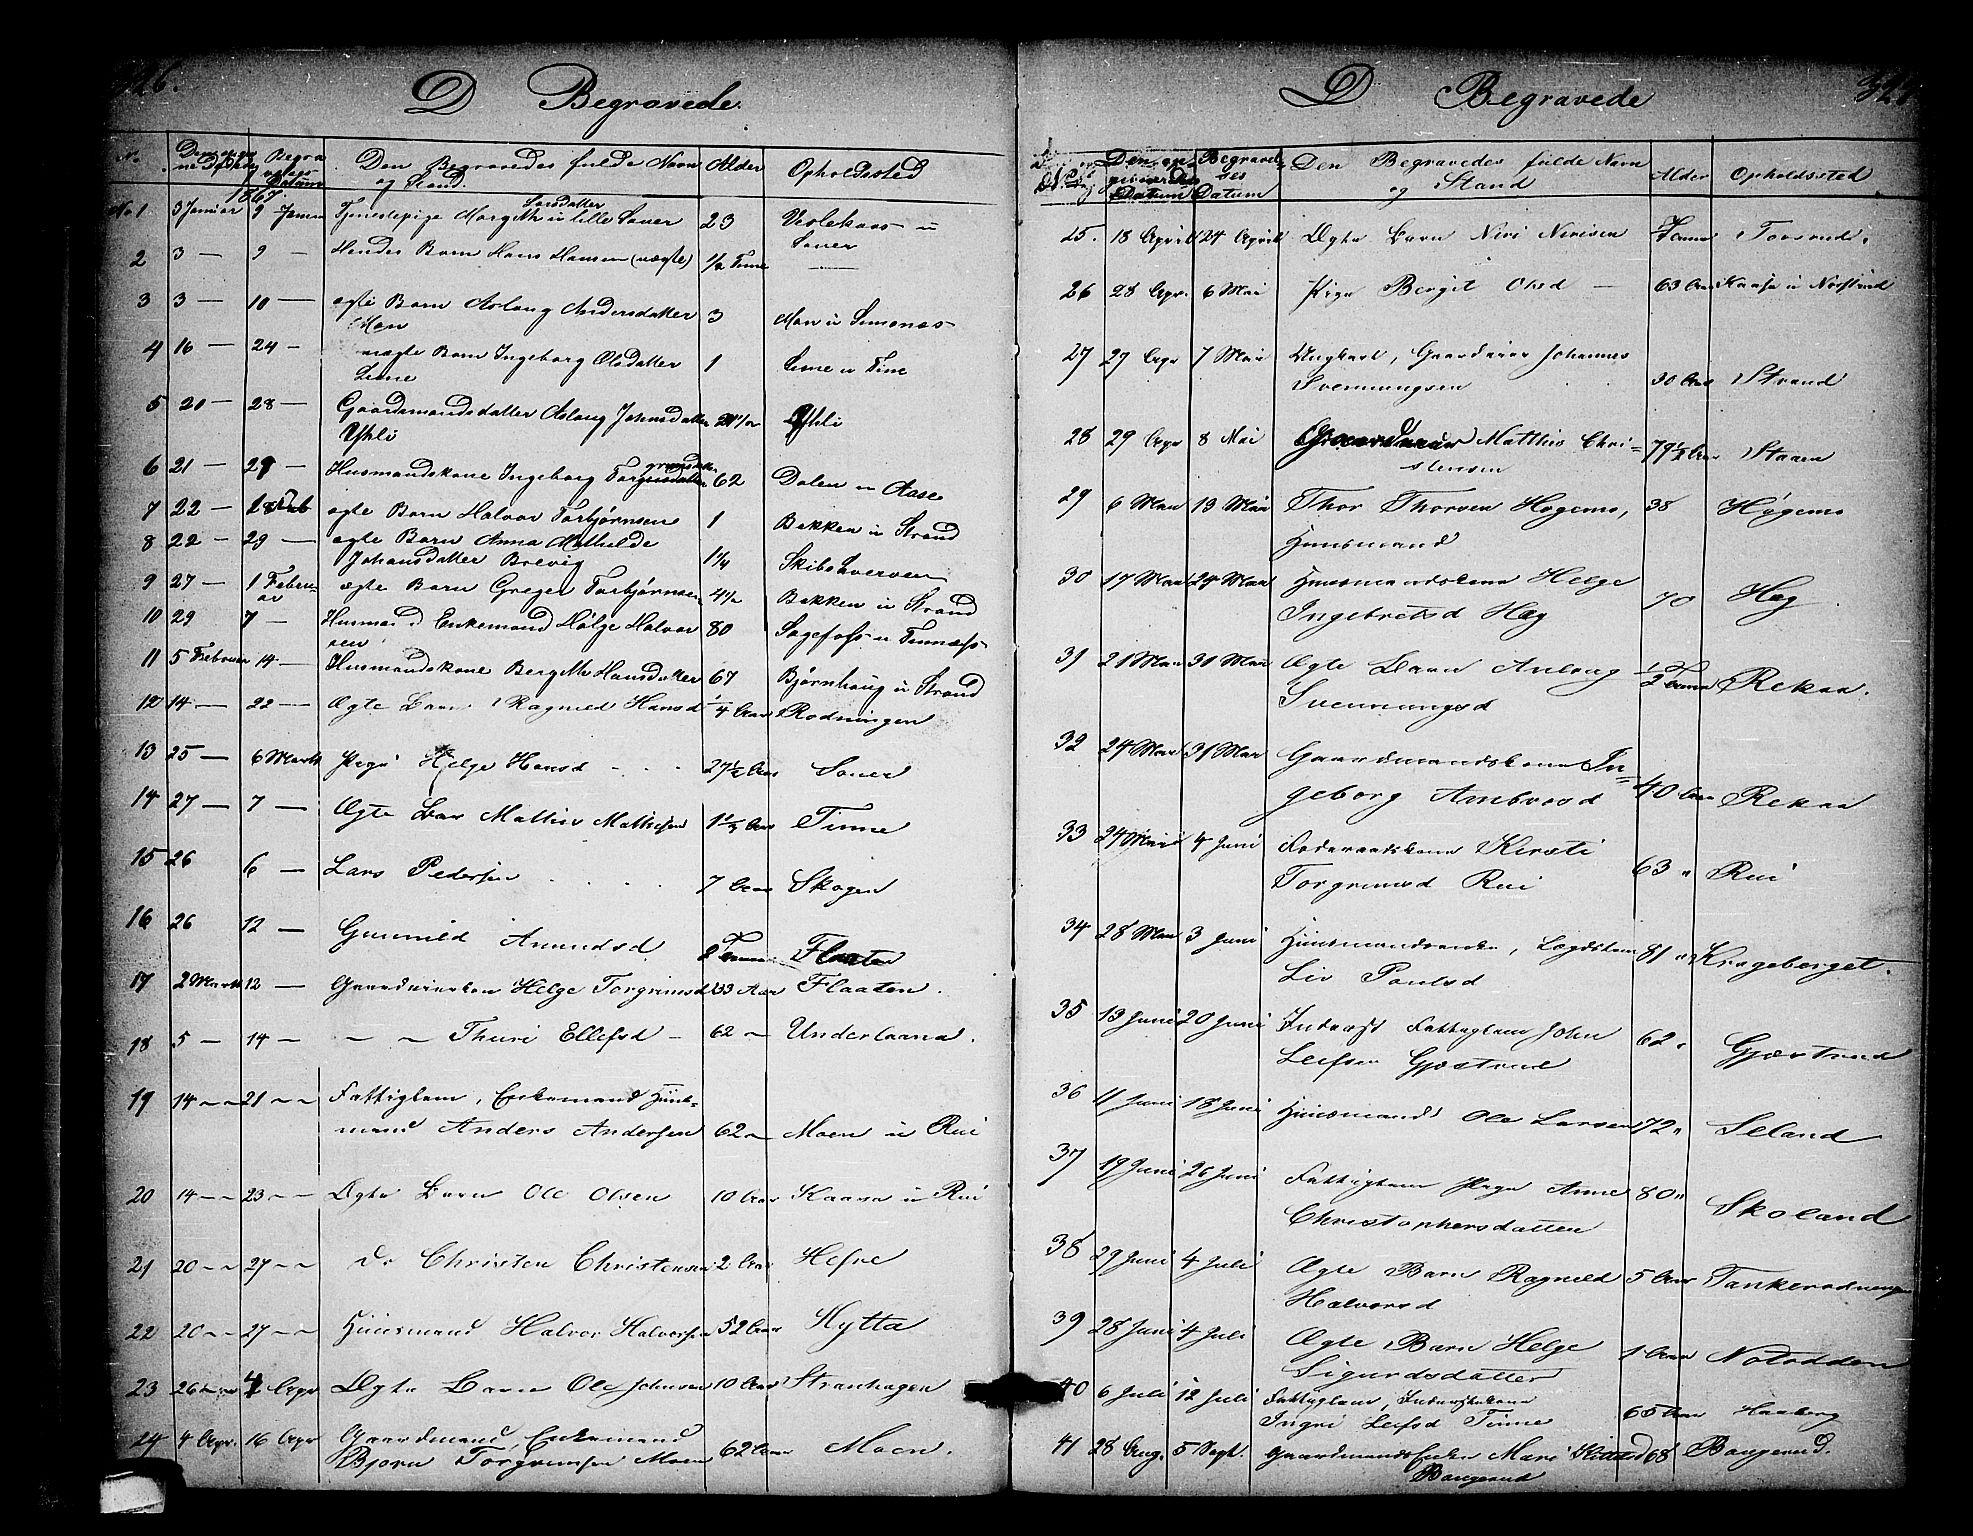 SAKO, Heddal kirkebøker, G/Ga/L0001: Klokkerbok nr. I 1, 1866-1878, s. 326-327